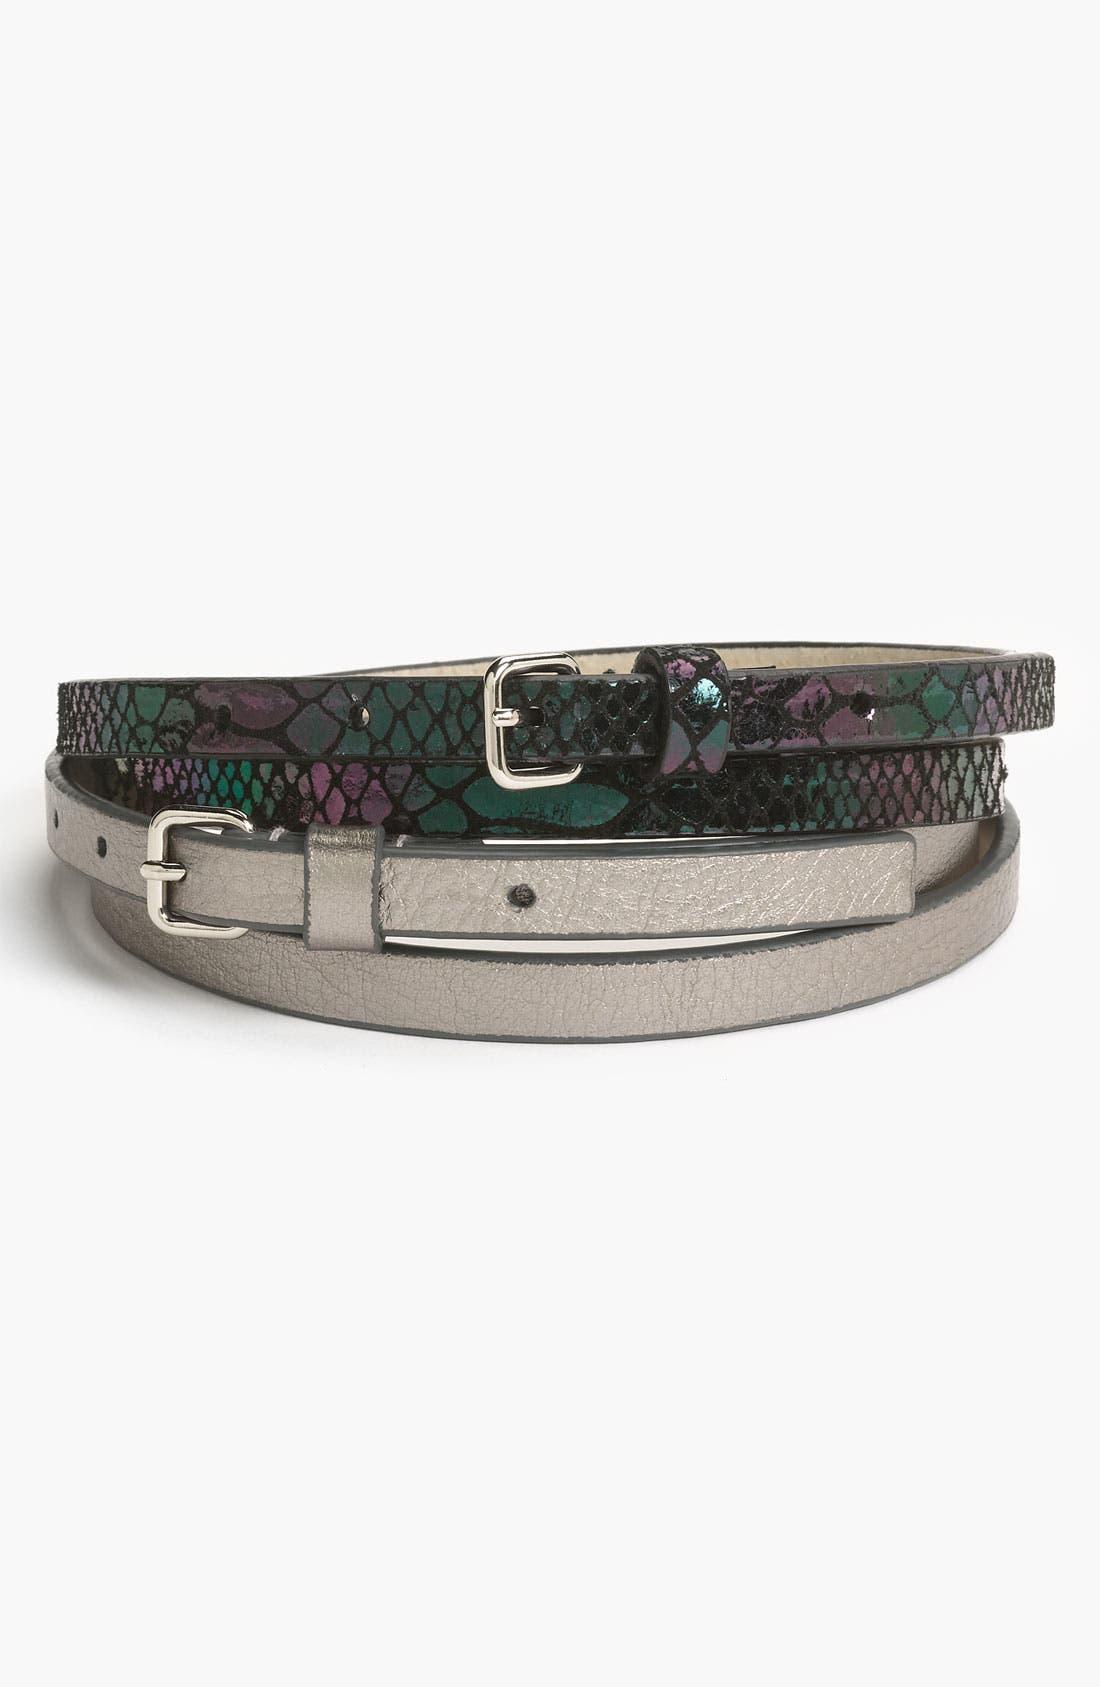 Alternate Image 1 Selected - Lodis '2-Fer' Leather Belts